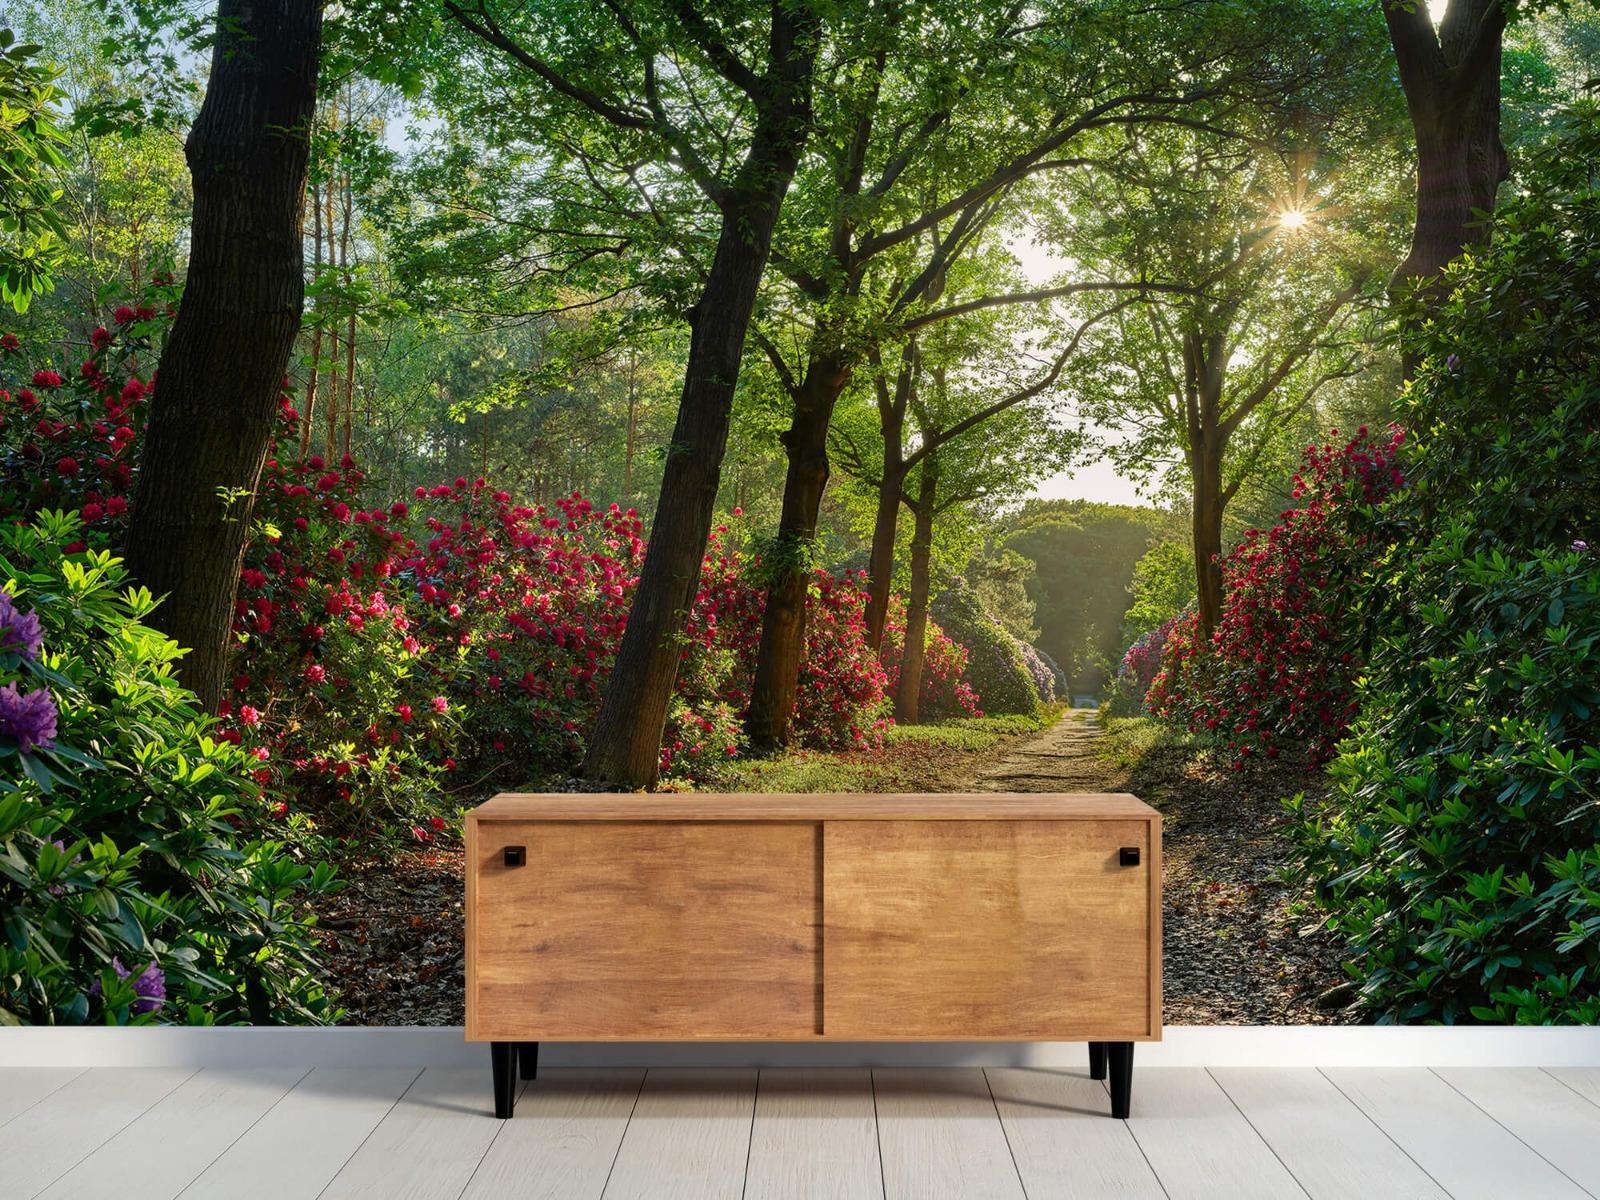 Bos - Zonsopkomst bij pad met rhododendrons 11